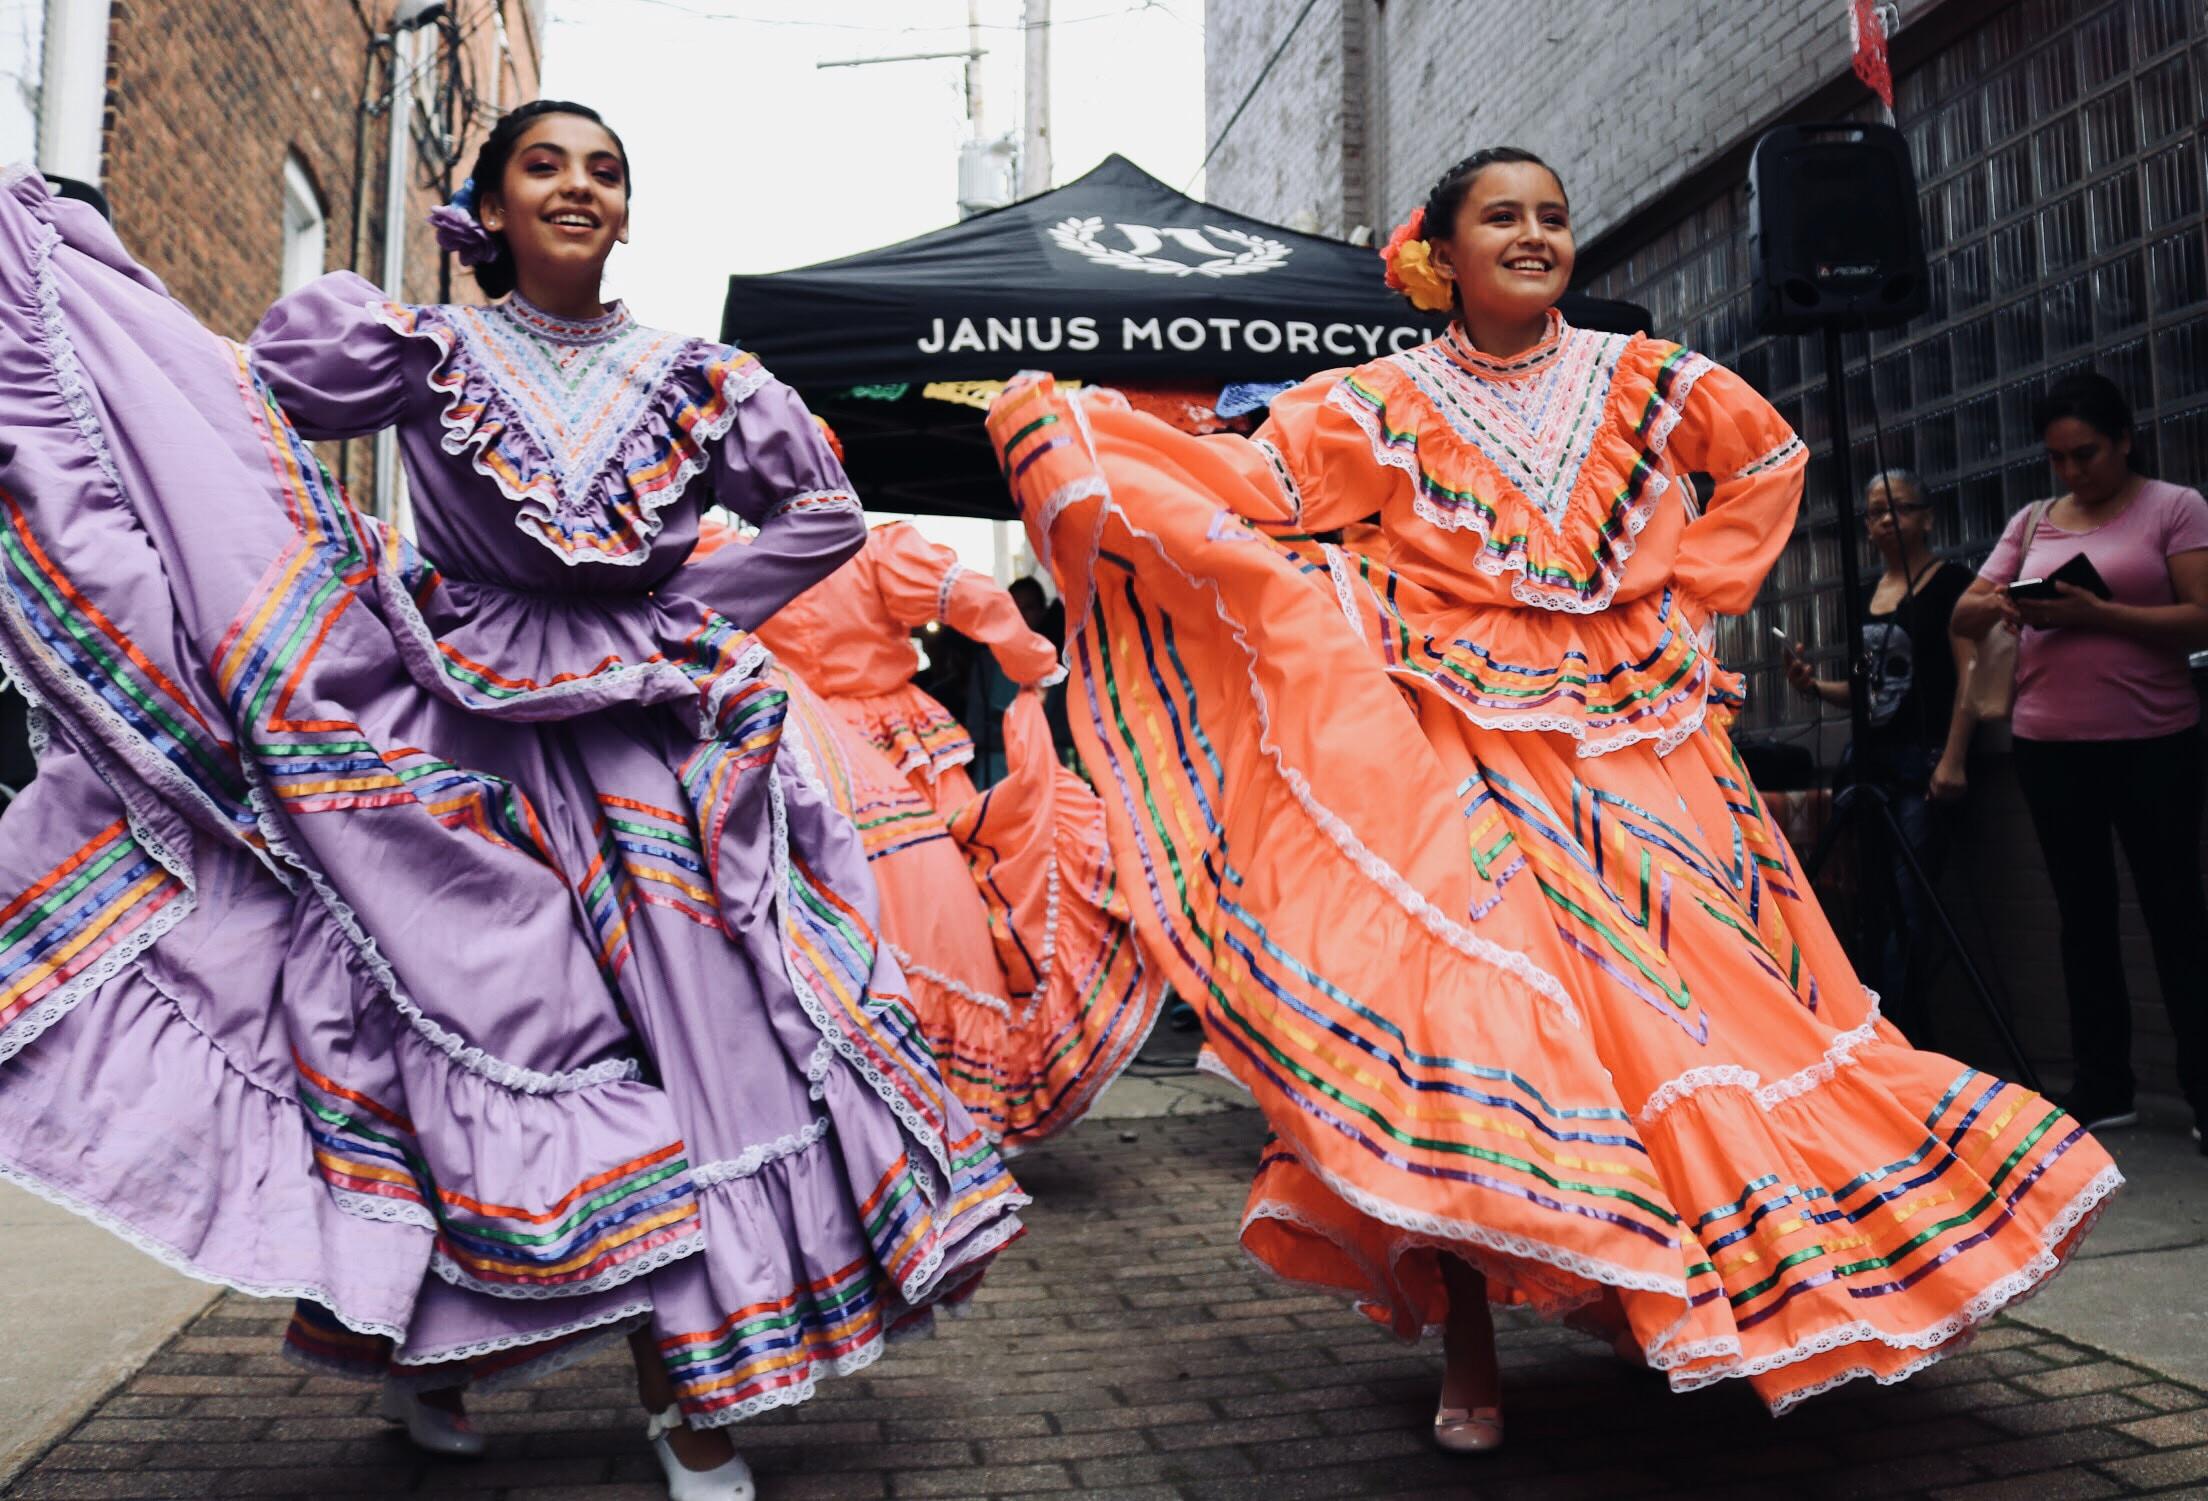 women in street dancing